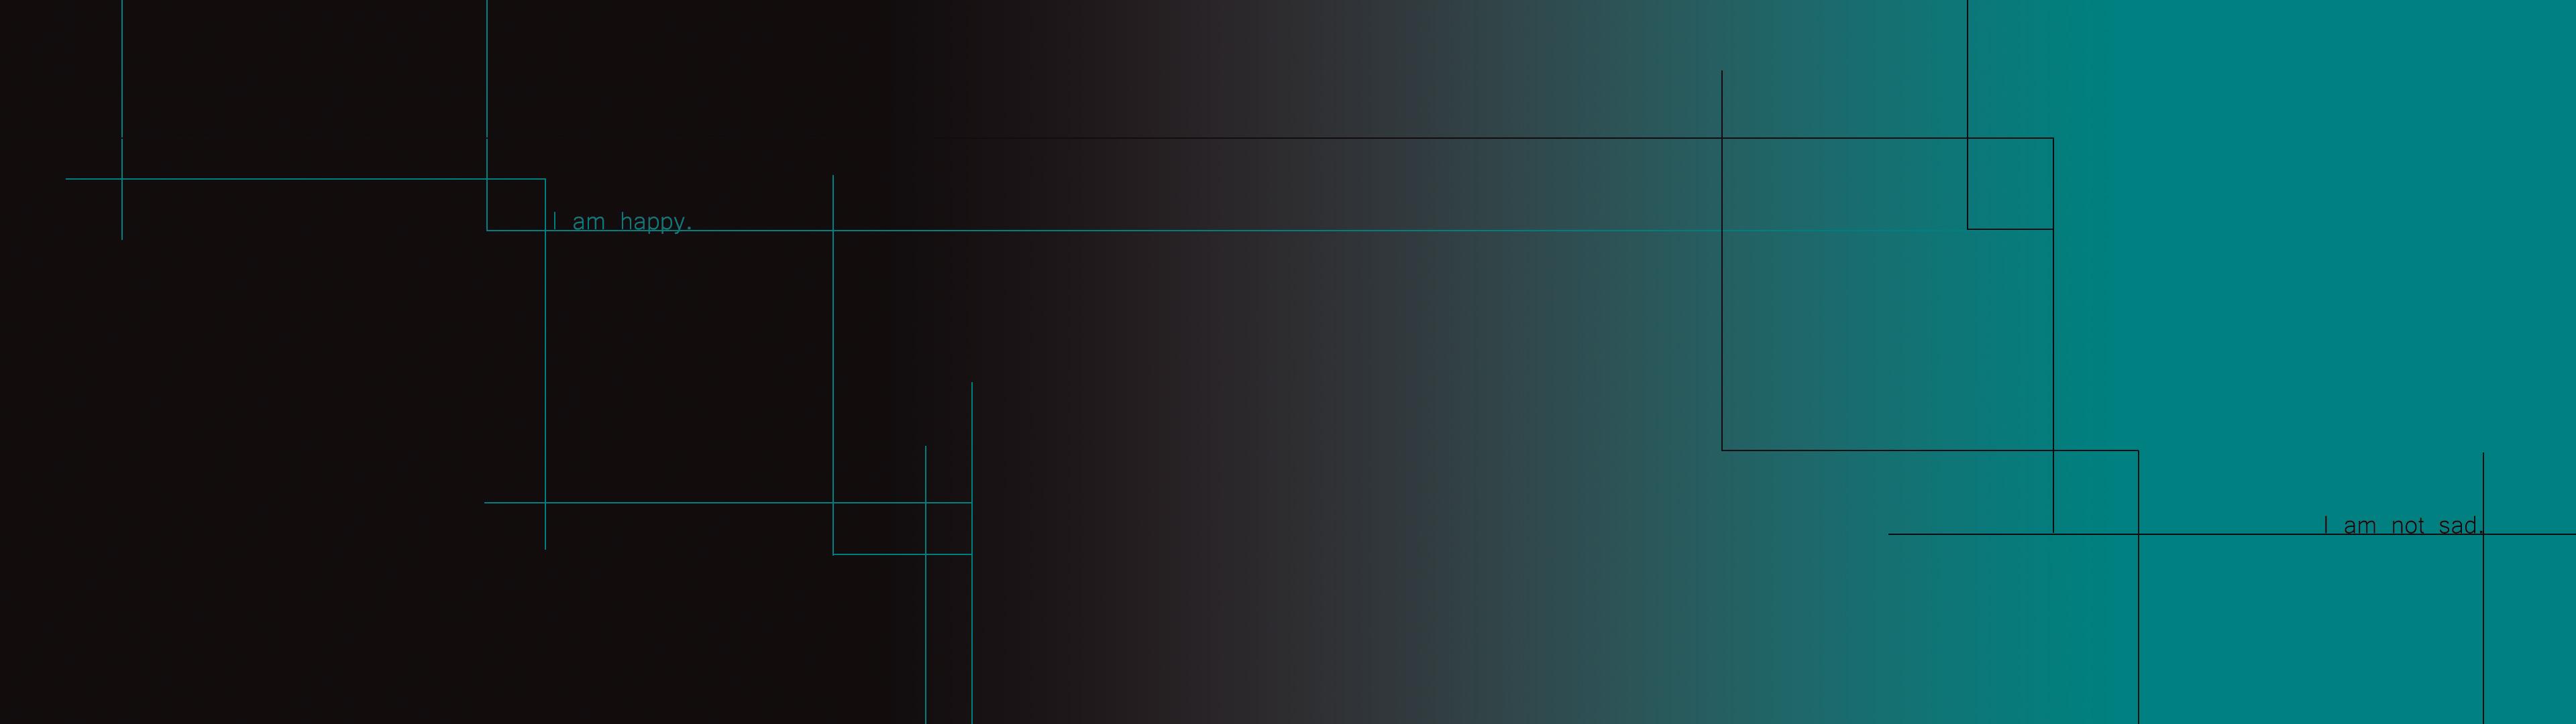 [49+] 3840x1080 HD Dual Monitor Wallpaper On WallpaperSafari